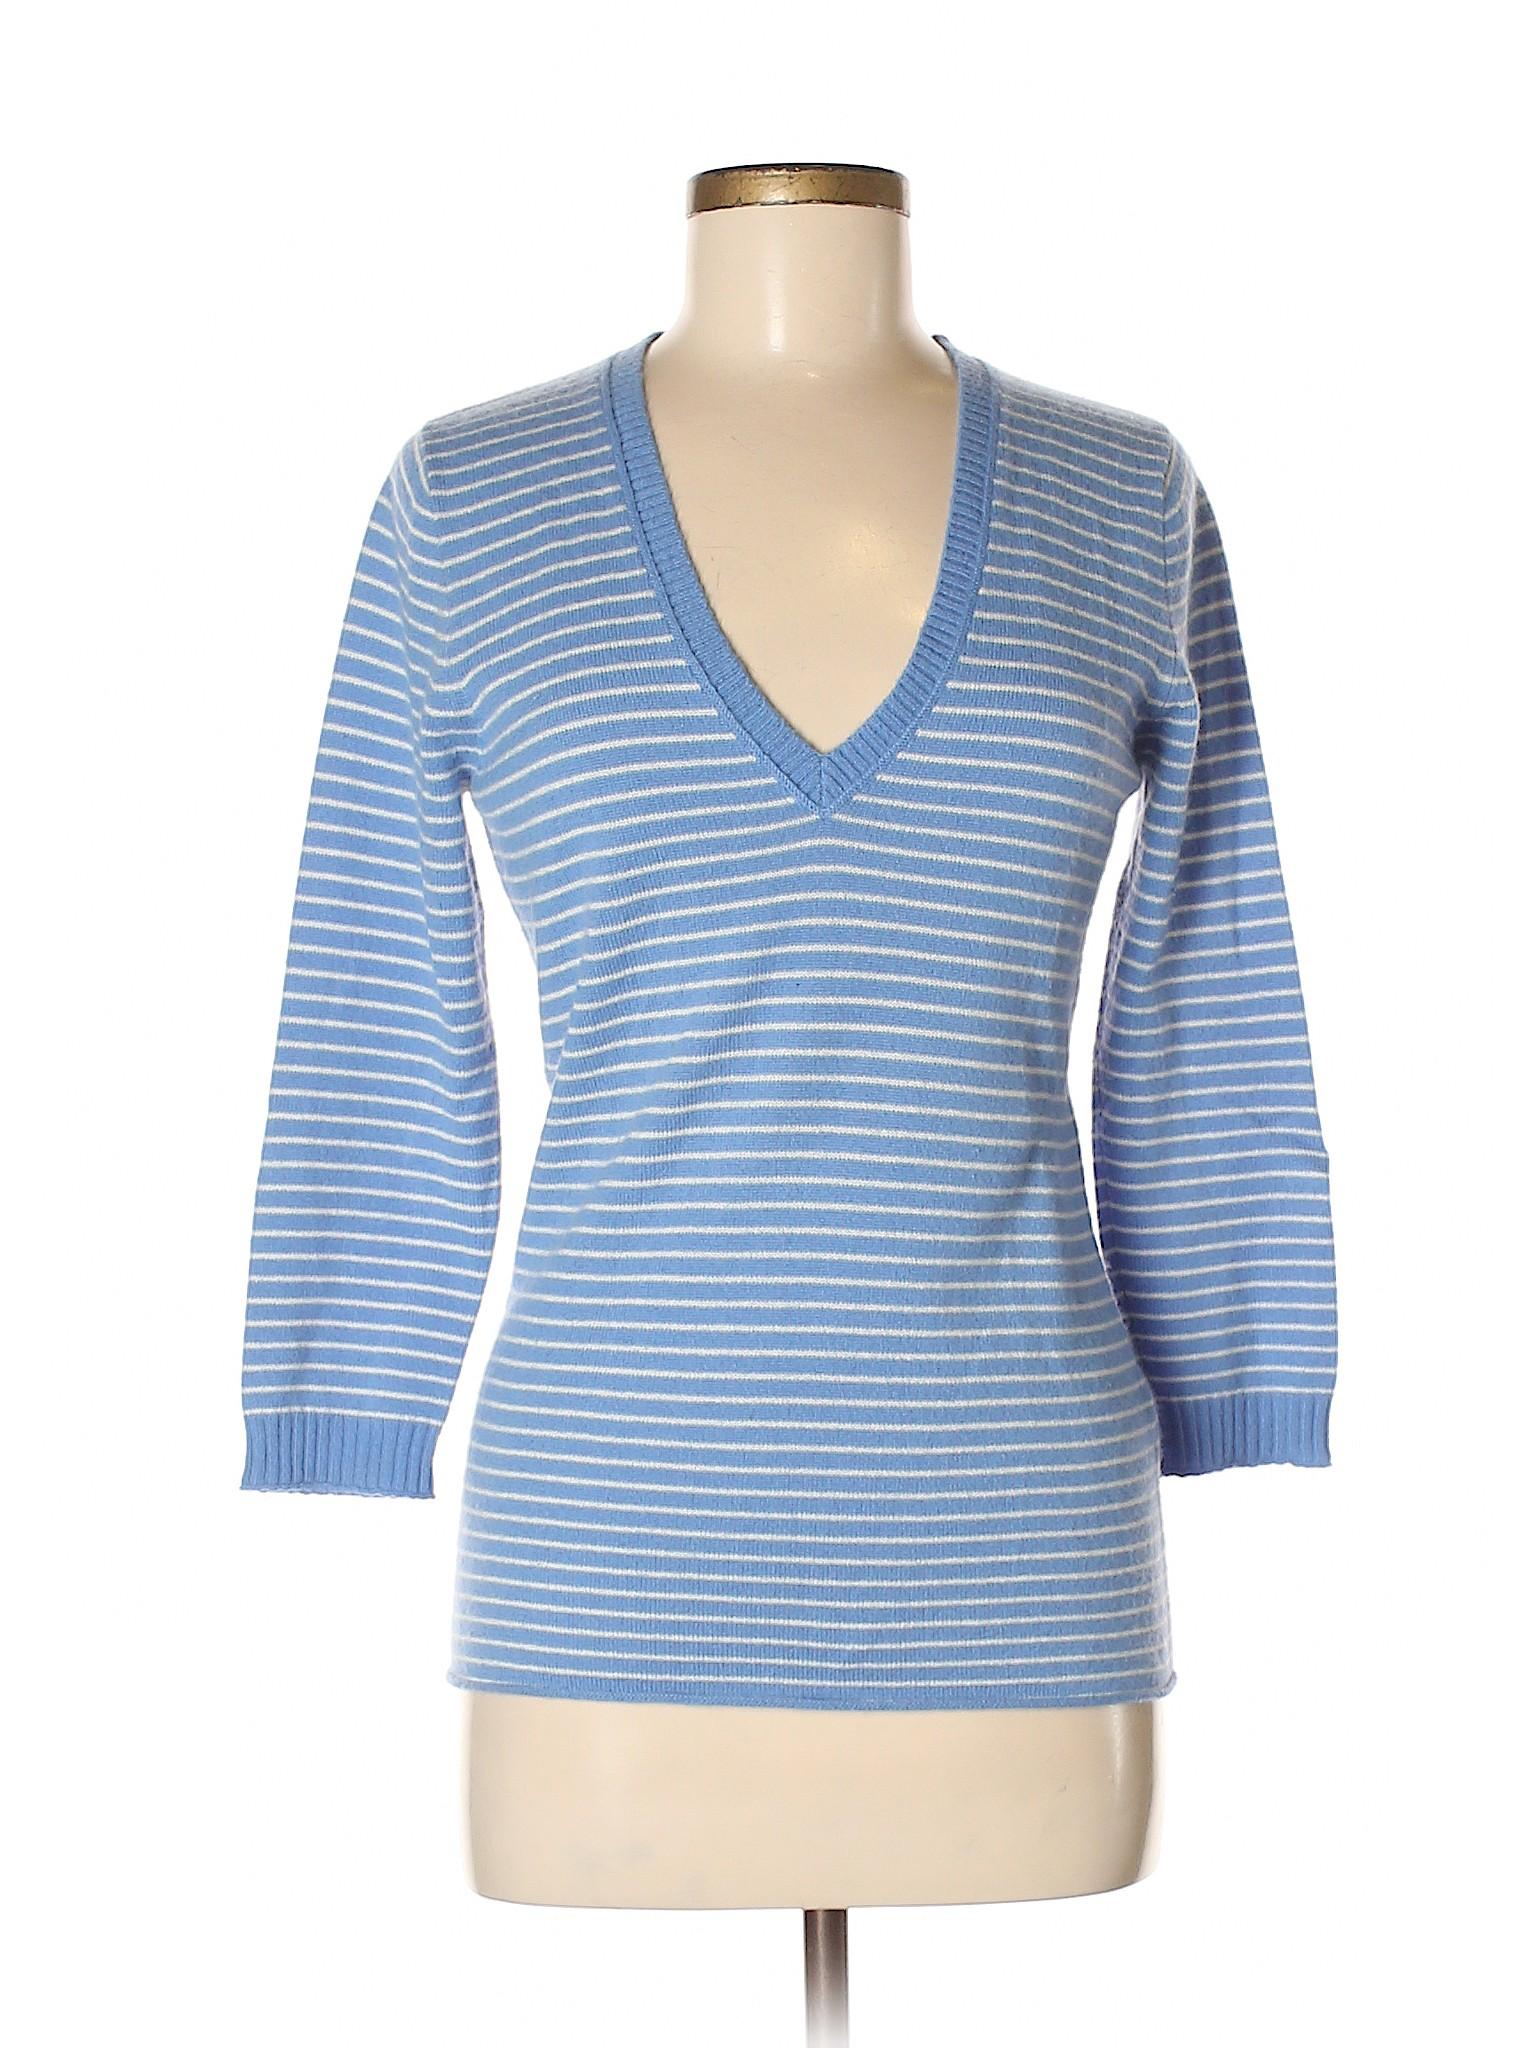 Cashmere Pullover Boutique Crew Sweater J v4Wgwq6H